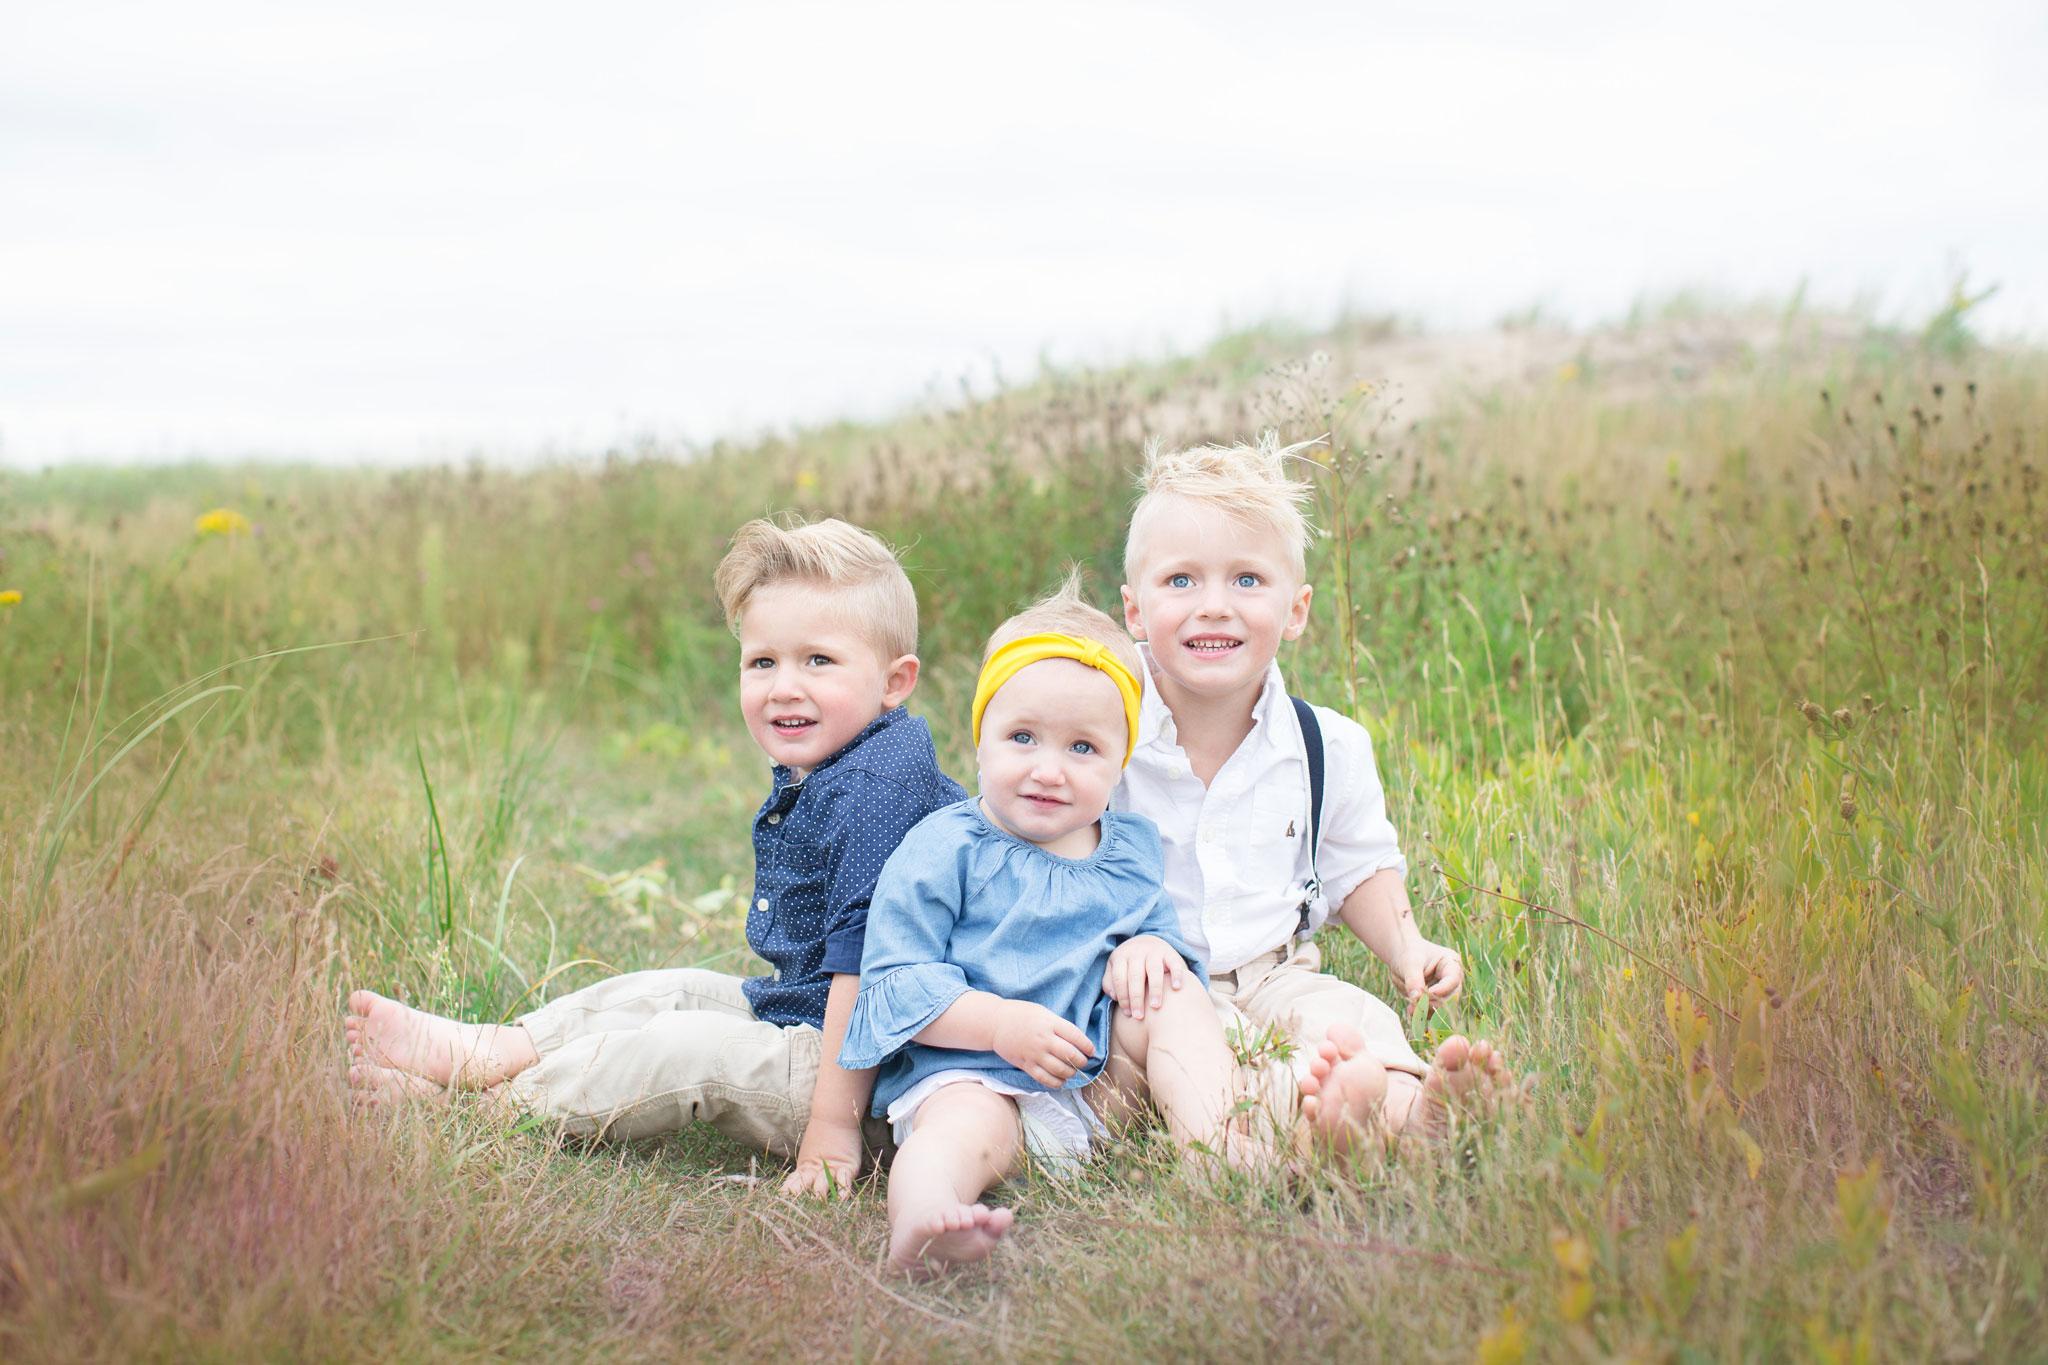 Three children sitting in the field of grass